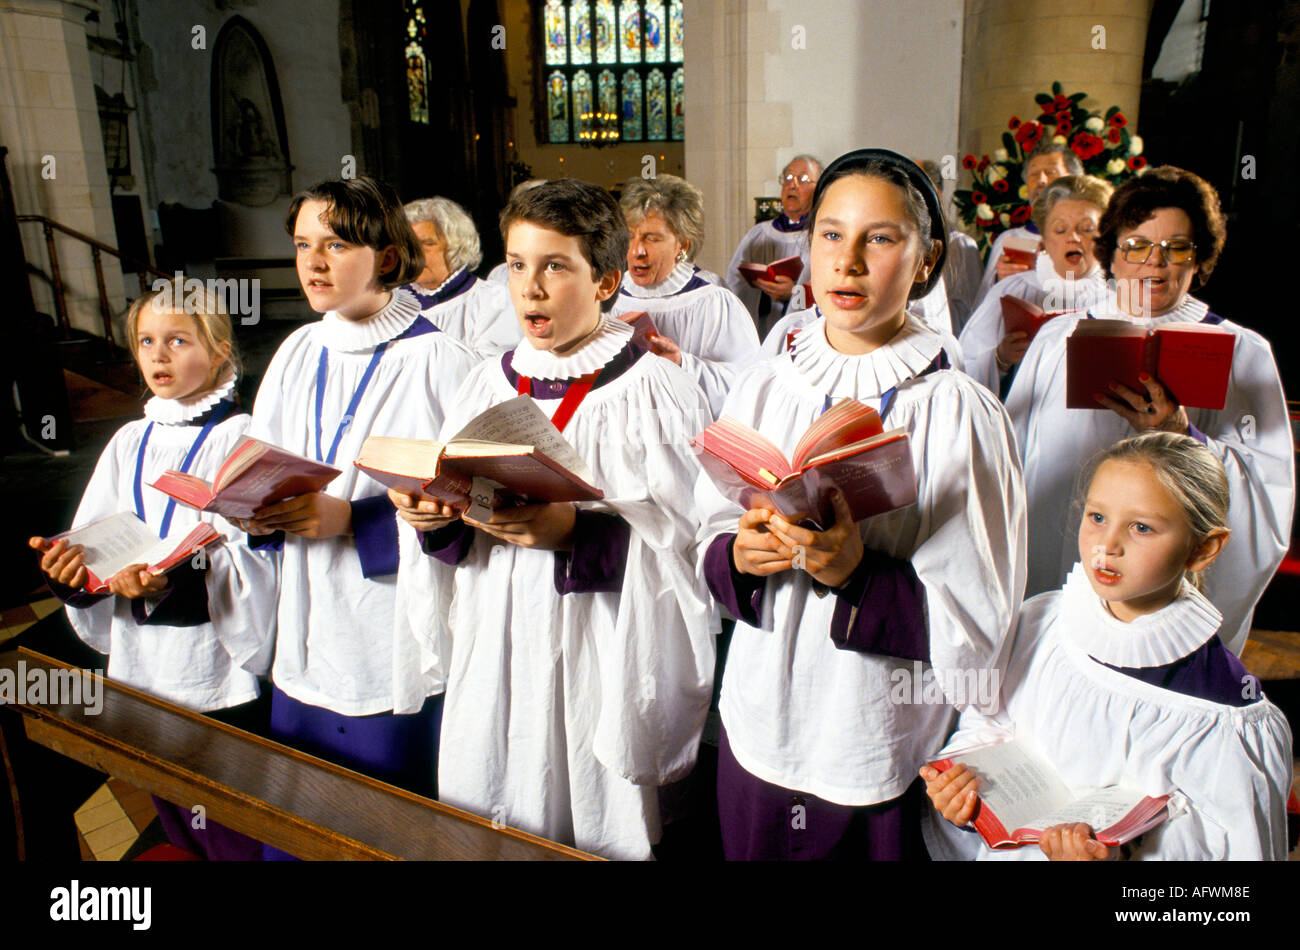 young boy singing in church